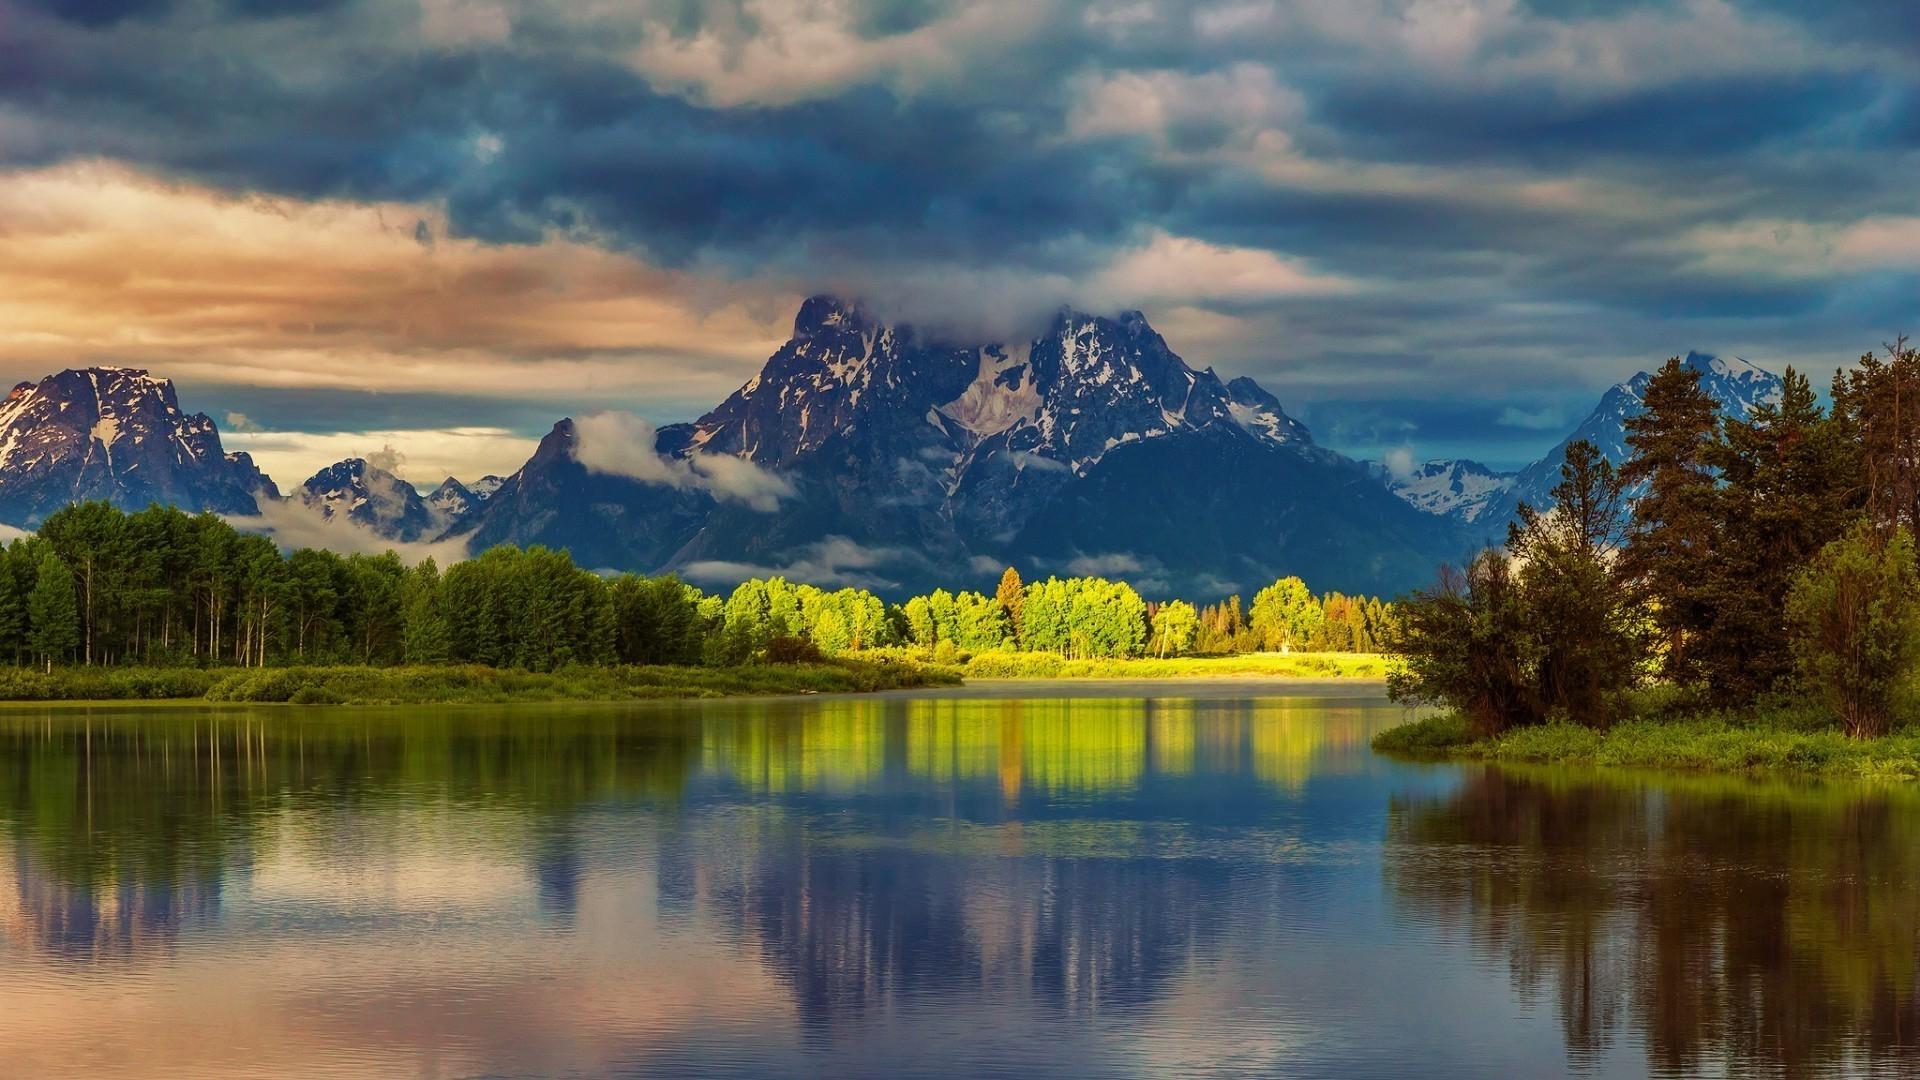 Лес горы и река картинки и обои (15)